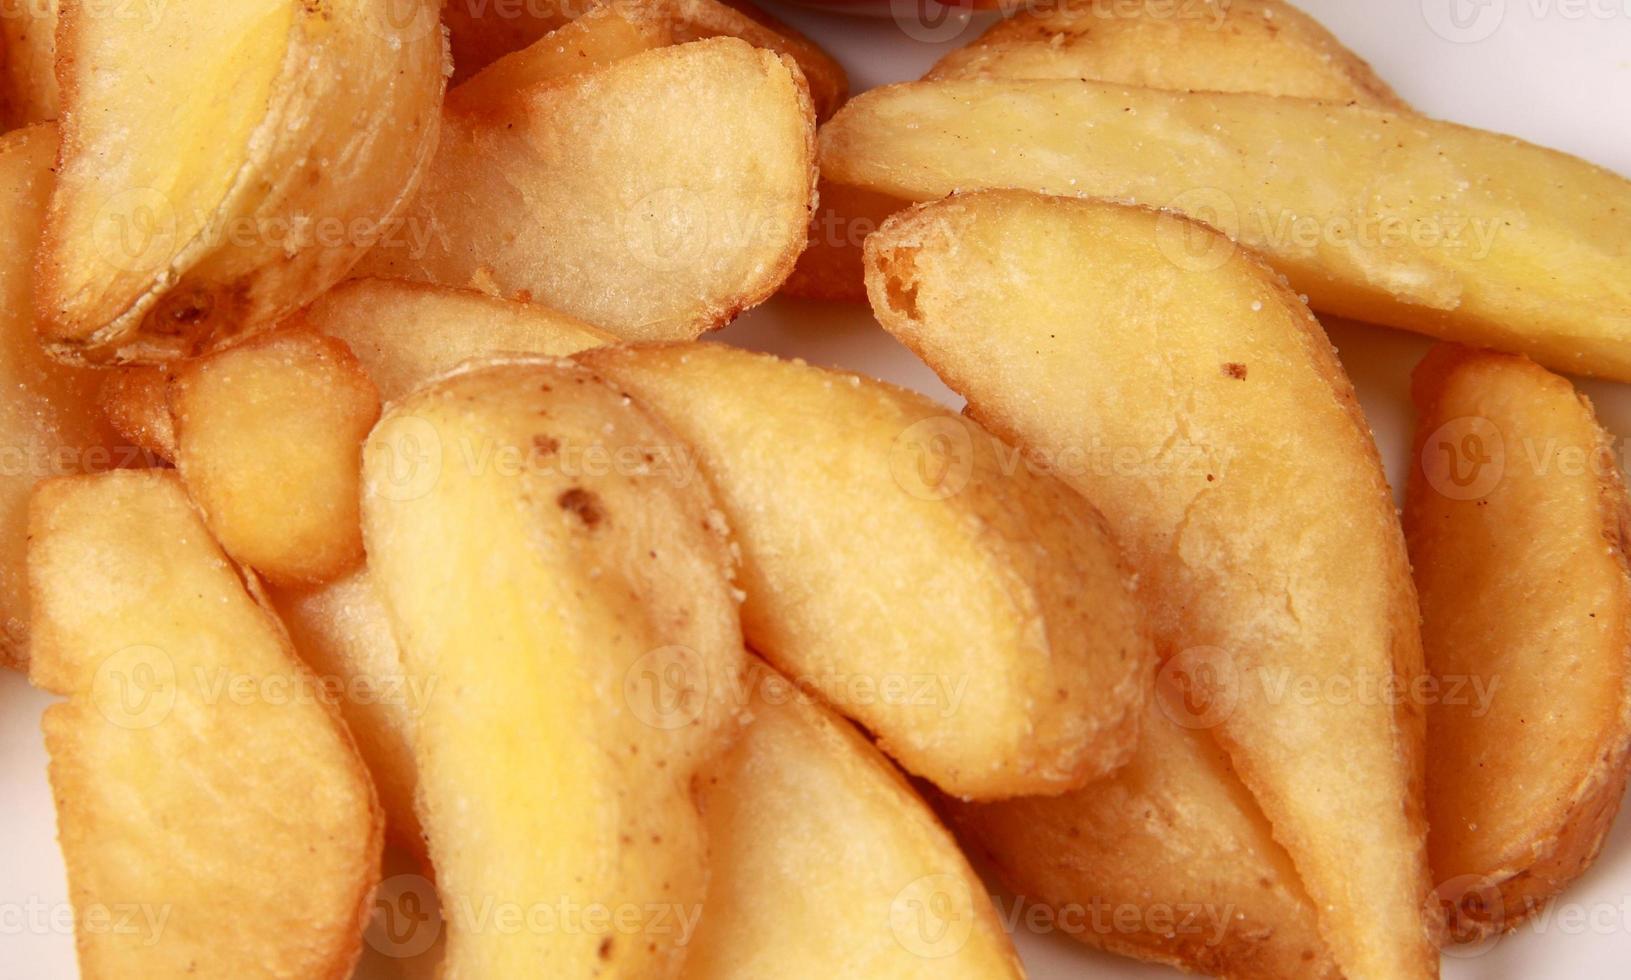 coocked potato close up photo